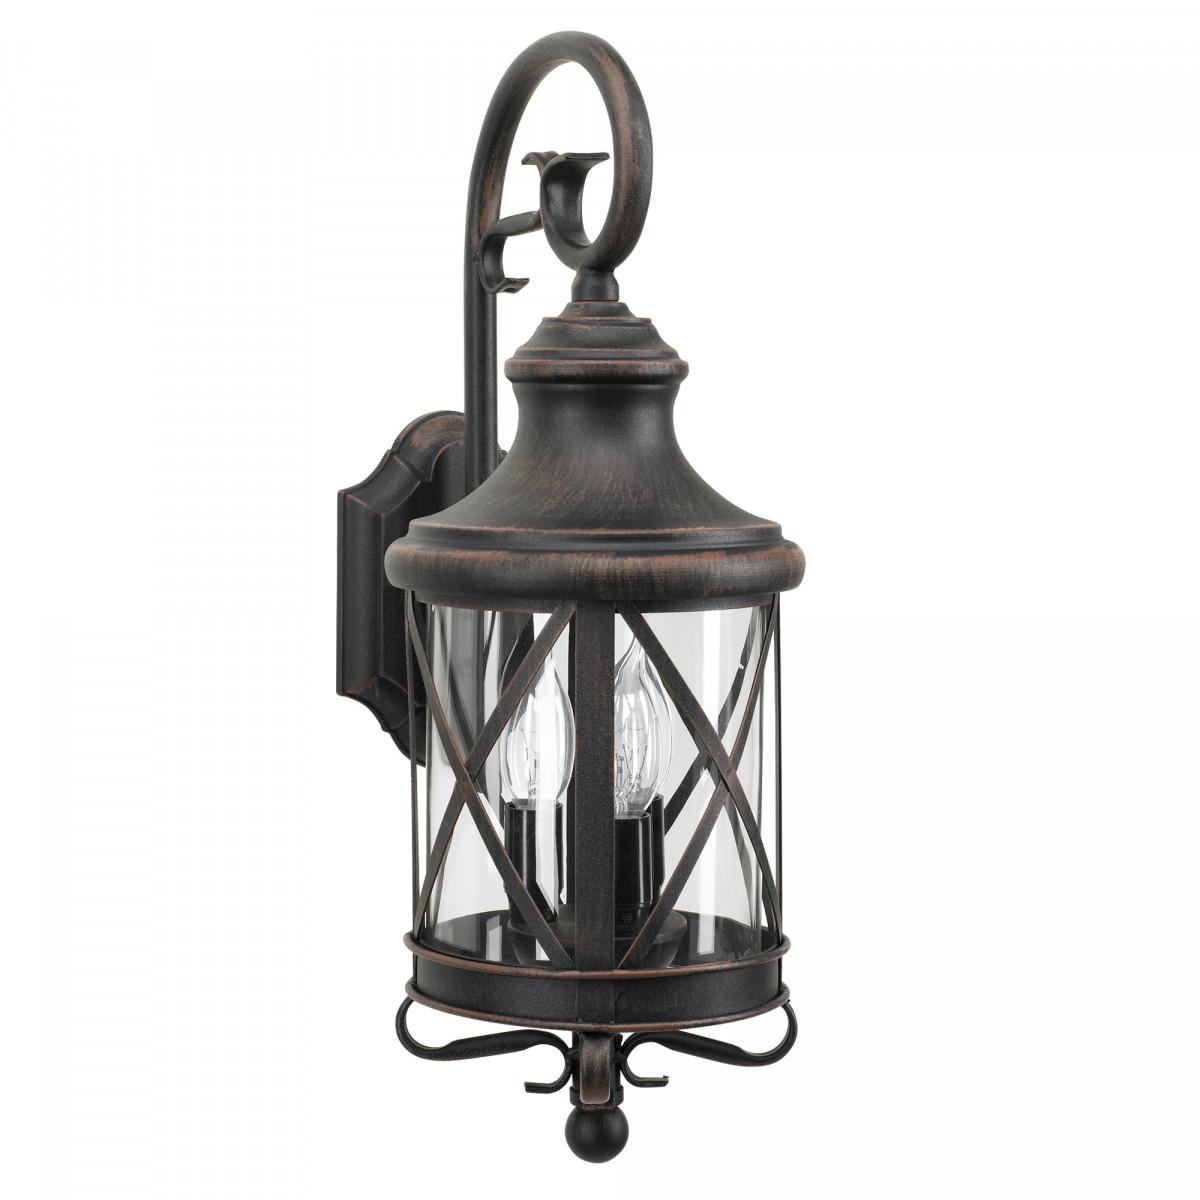 Romantik Außenlampe 7420 wandleuchte wandlampe